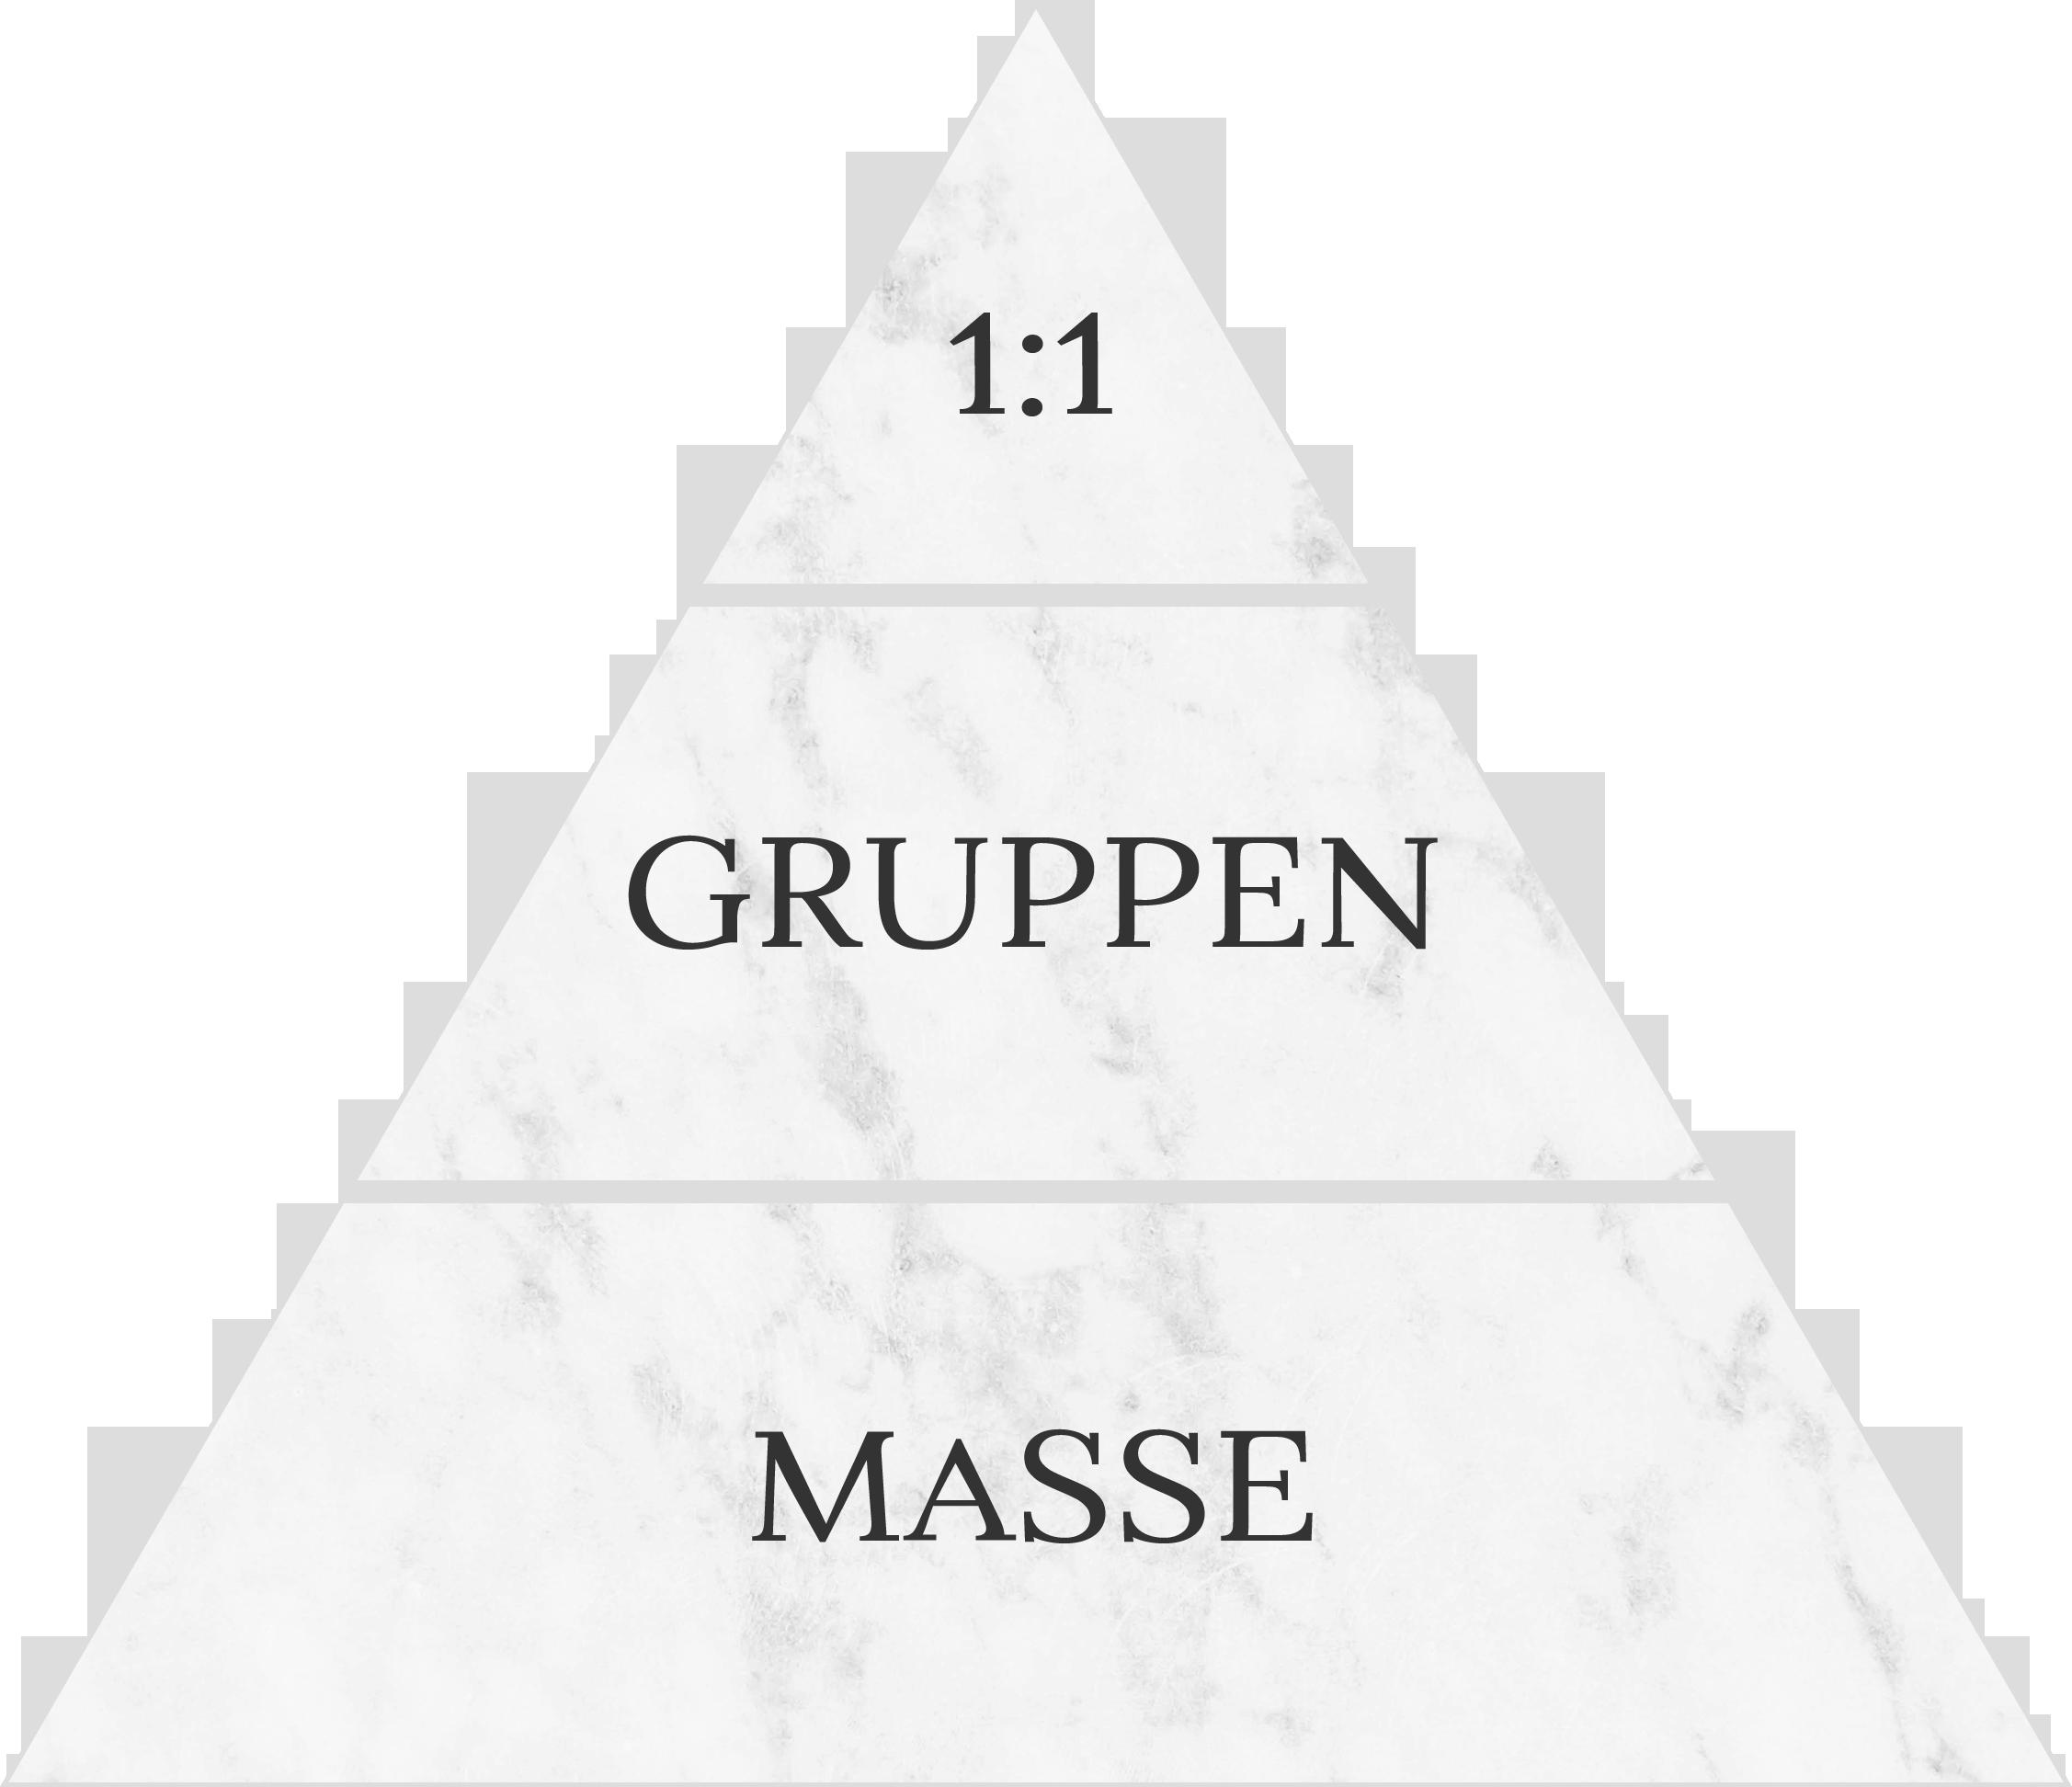 angebotspyramide.png